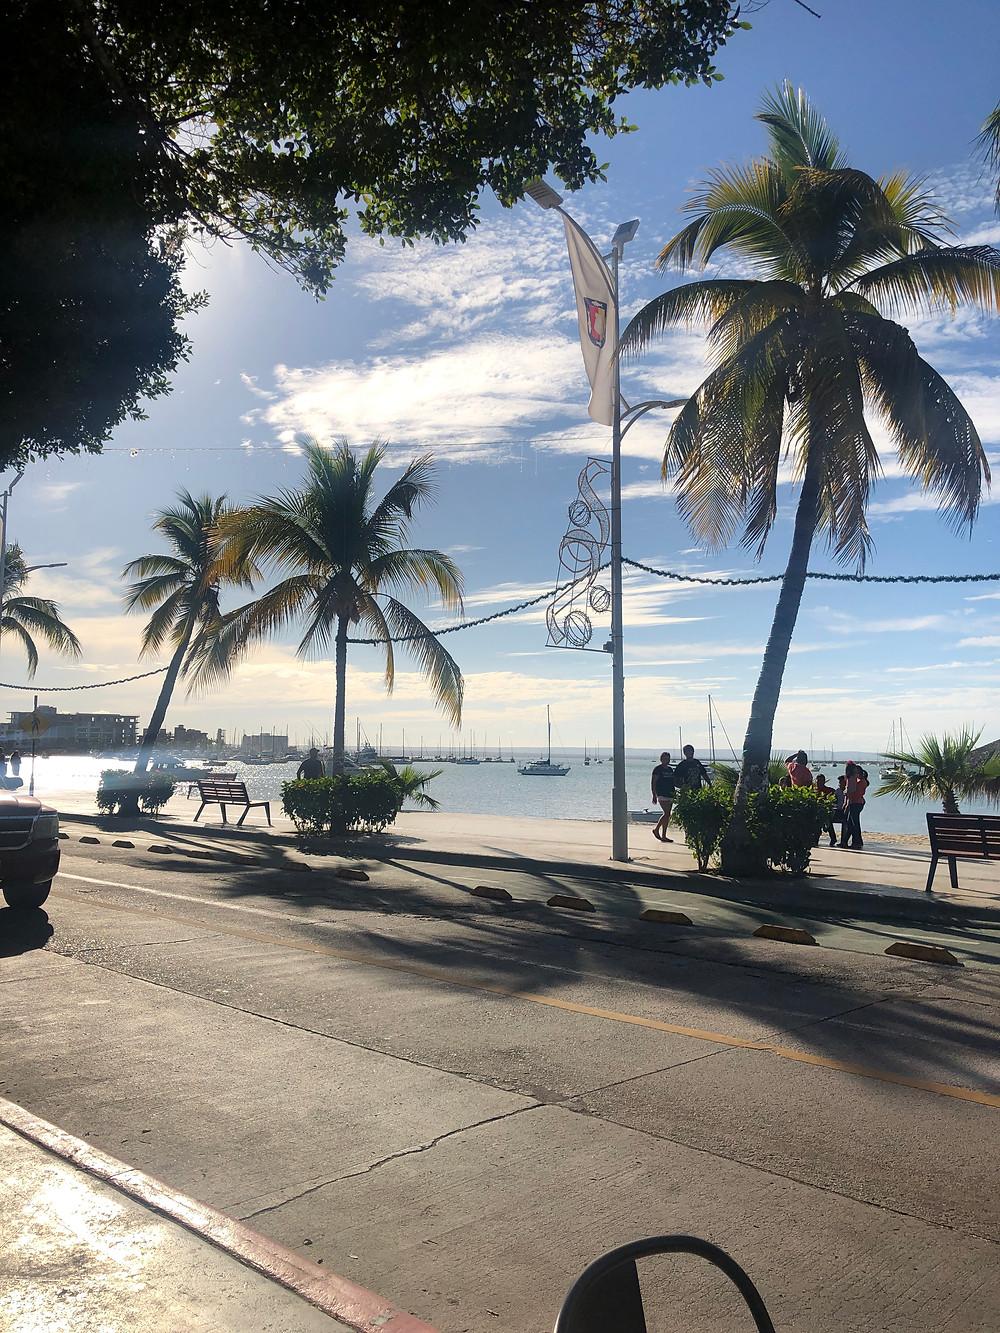 la paz malecon with palm trees